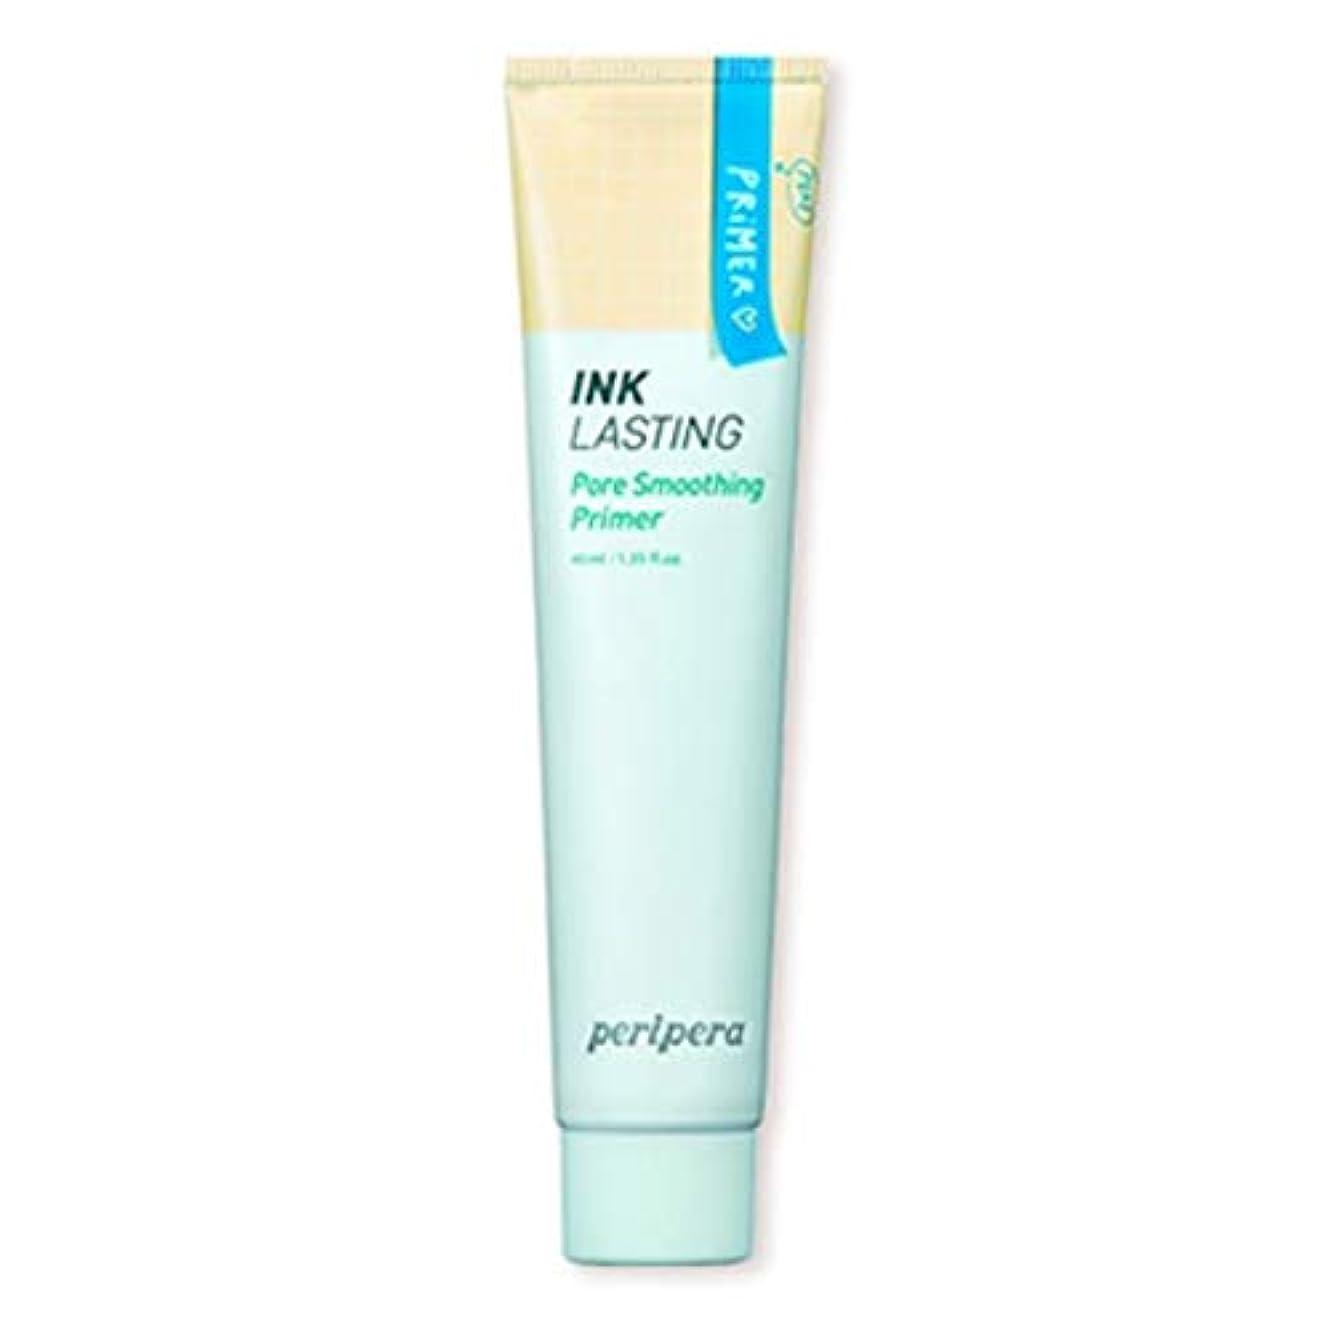 Peripera Inklasting Pore Smoothing Primerペリペラ インクラスティングポアスムージングプライマー [並行輸入品]